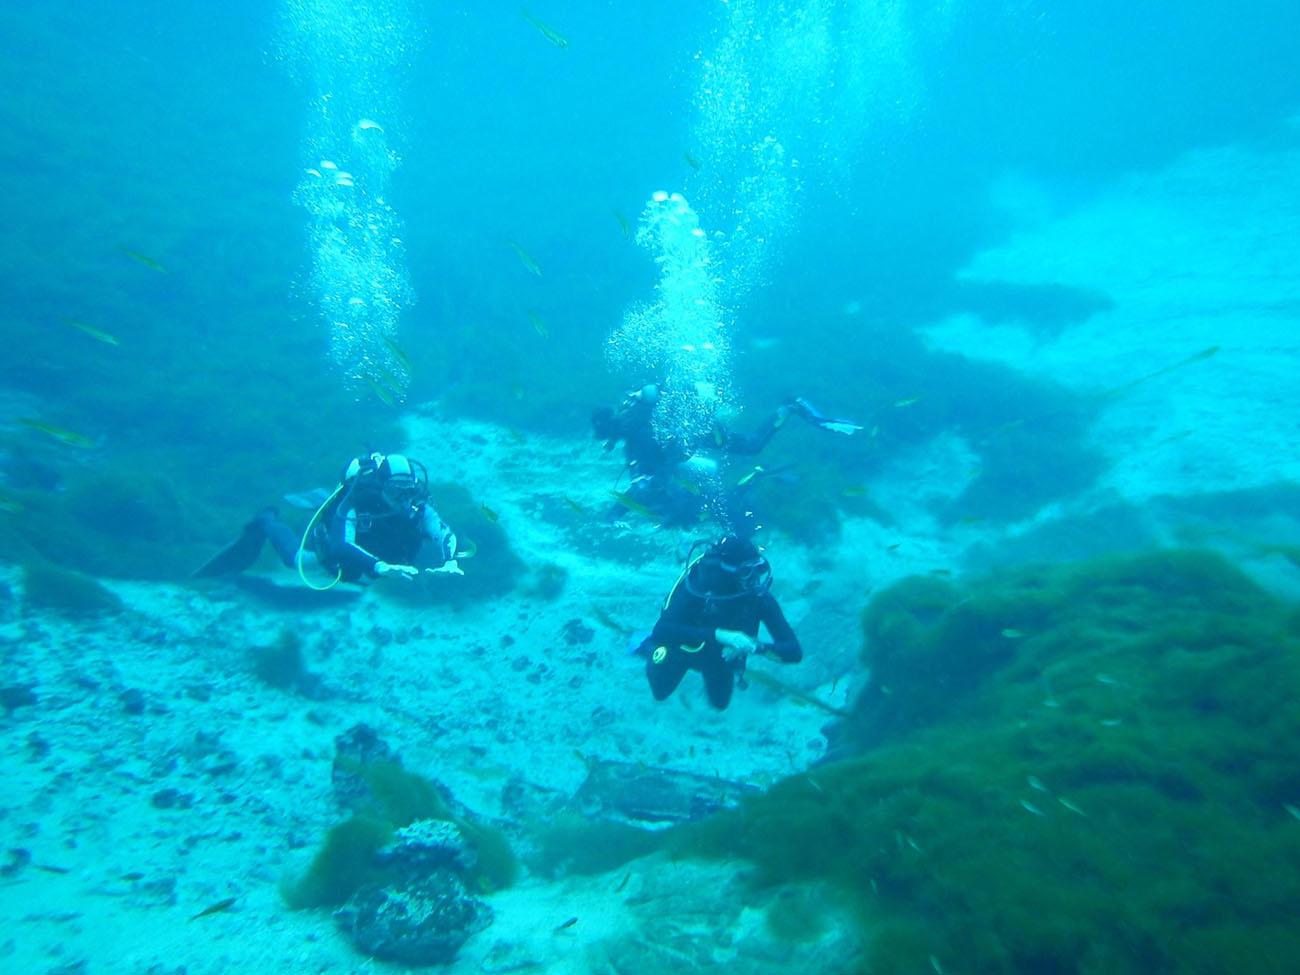 Orca diving6